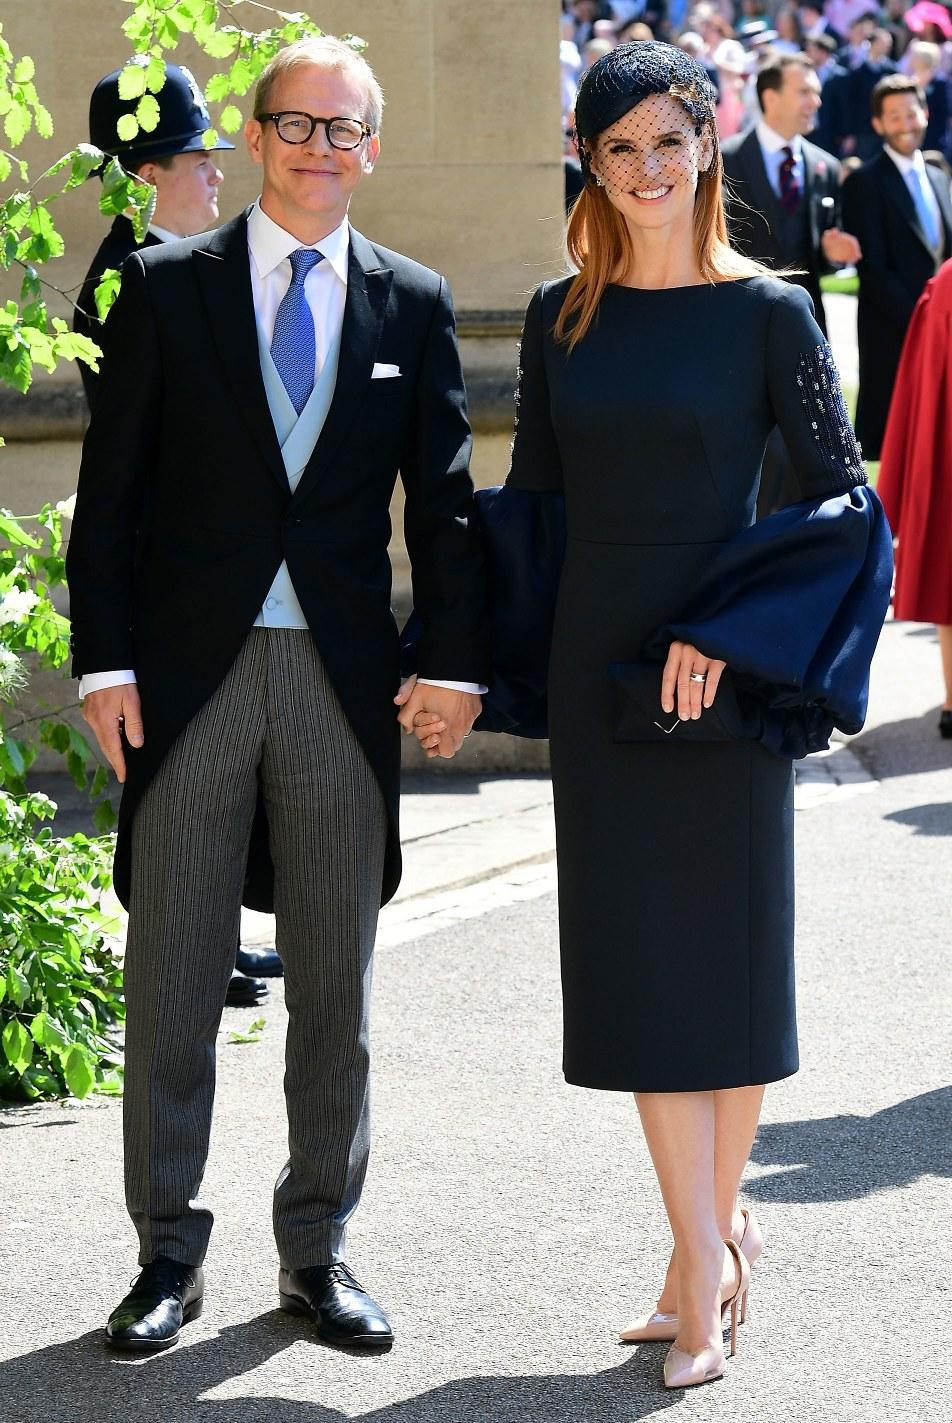 https://i1.wp.com/styleblog.ca/wp-content/uploads/2018/05/meghan-harry-royal-wedding-Sarah-Rafferty-and-Santtu-Seppala.jpg